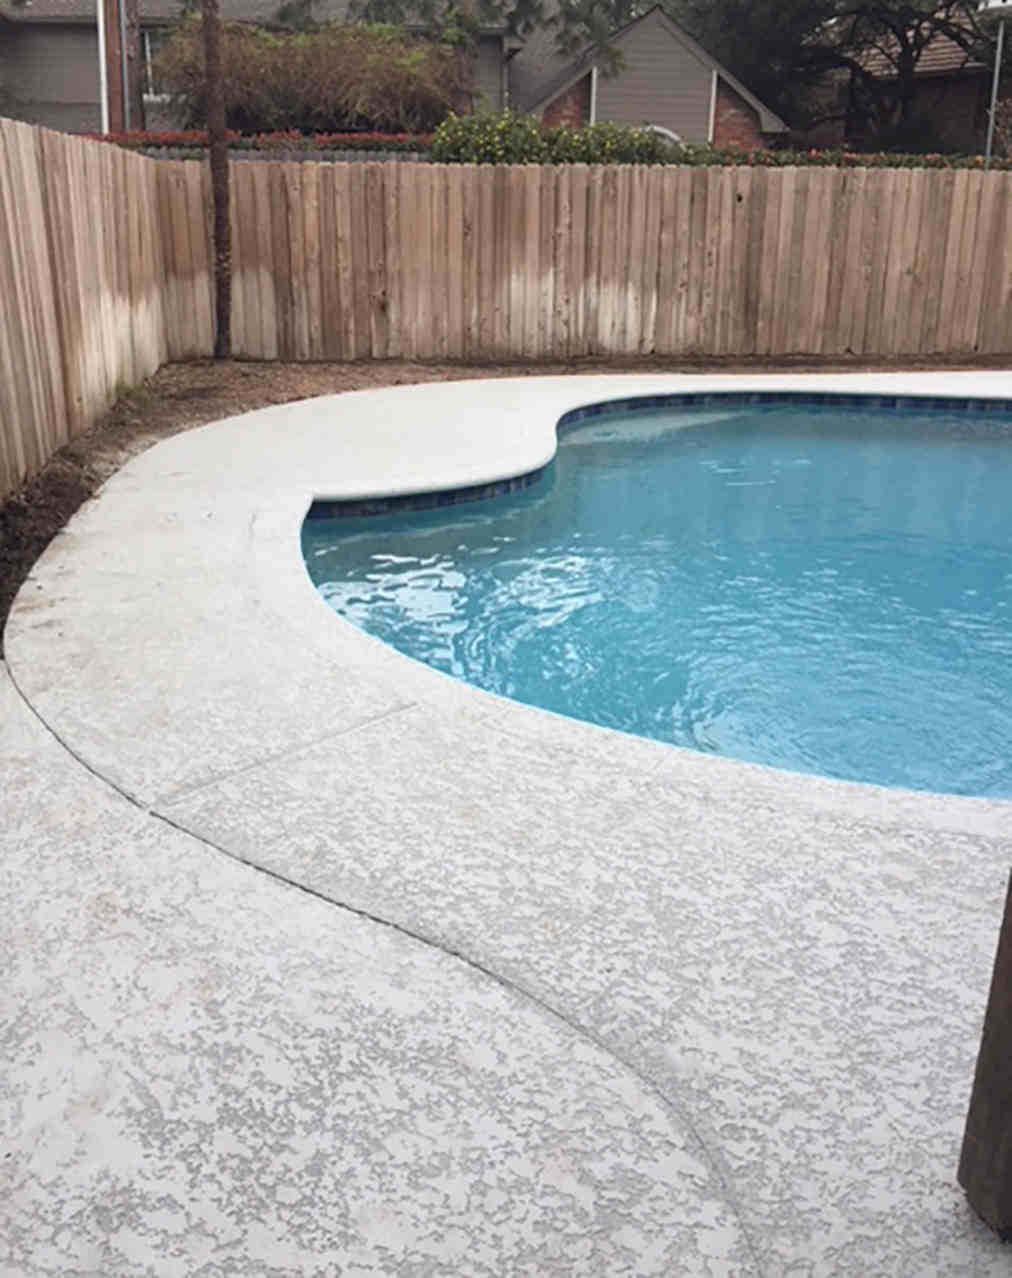 Pool Deck Repair After